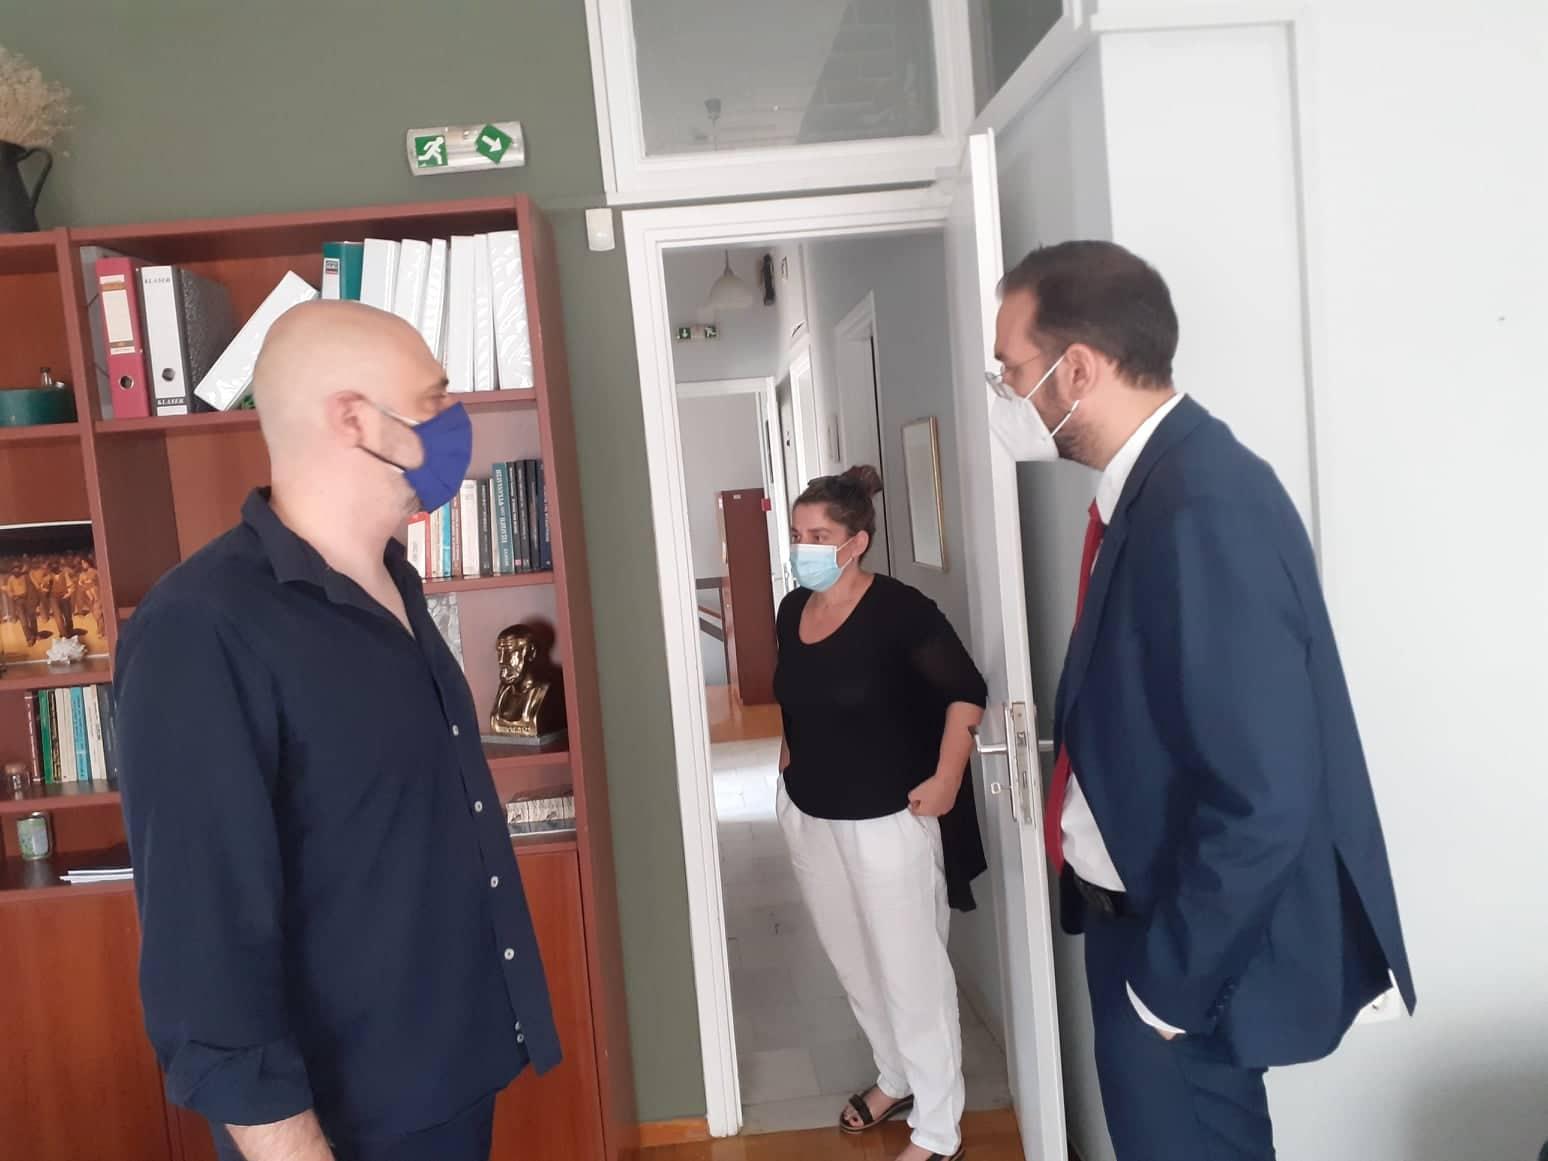 Tο προσεχώς αναβαθμιζόμενο ενεργειακά Κέντρο Ψυχικής Υγείας Αγρινίου επισκέφθηκαν Φαρμάκης- Δημητρογιάννης